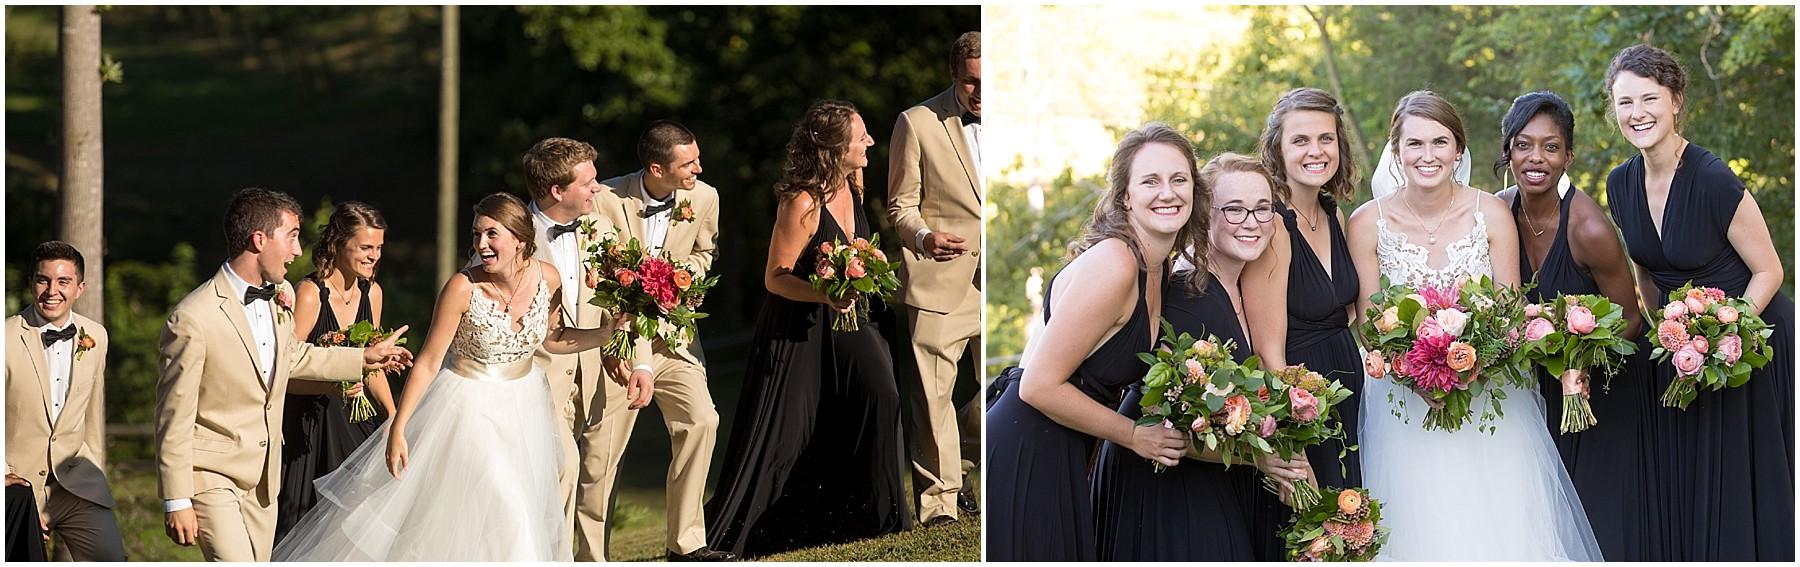 JoLo Winery Weddings